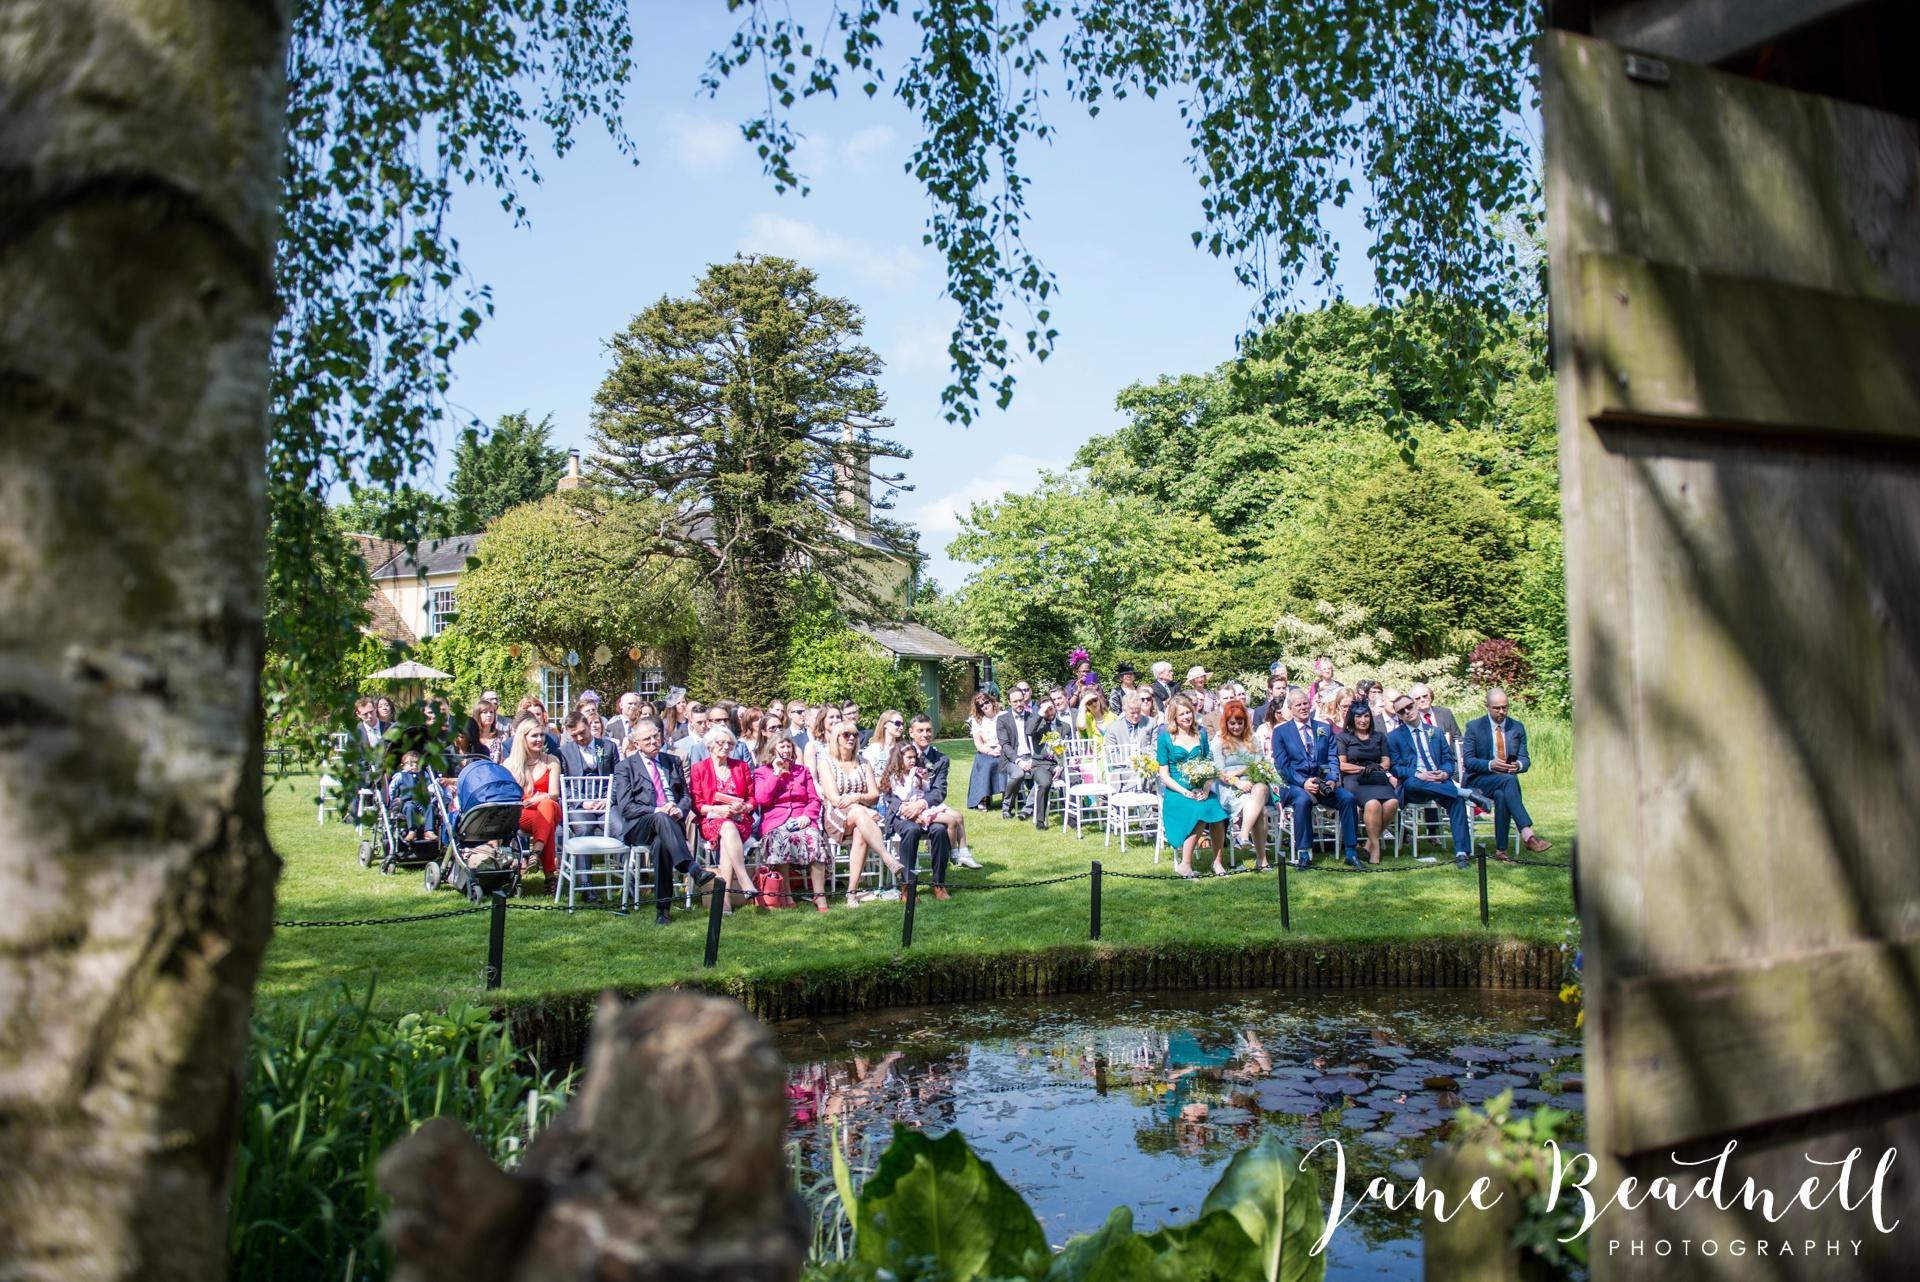 South Farm Wedding photography Hertfordshire by Jane Beadnell Photography fine art wedding photographer_0072